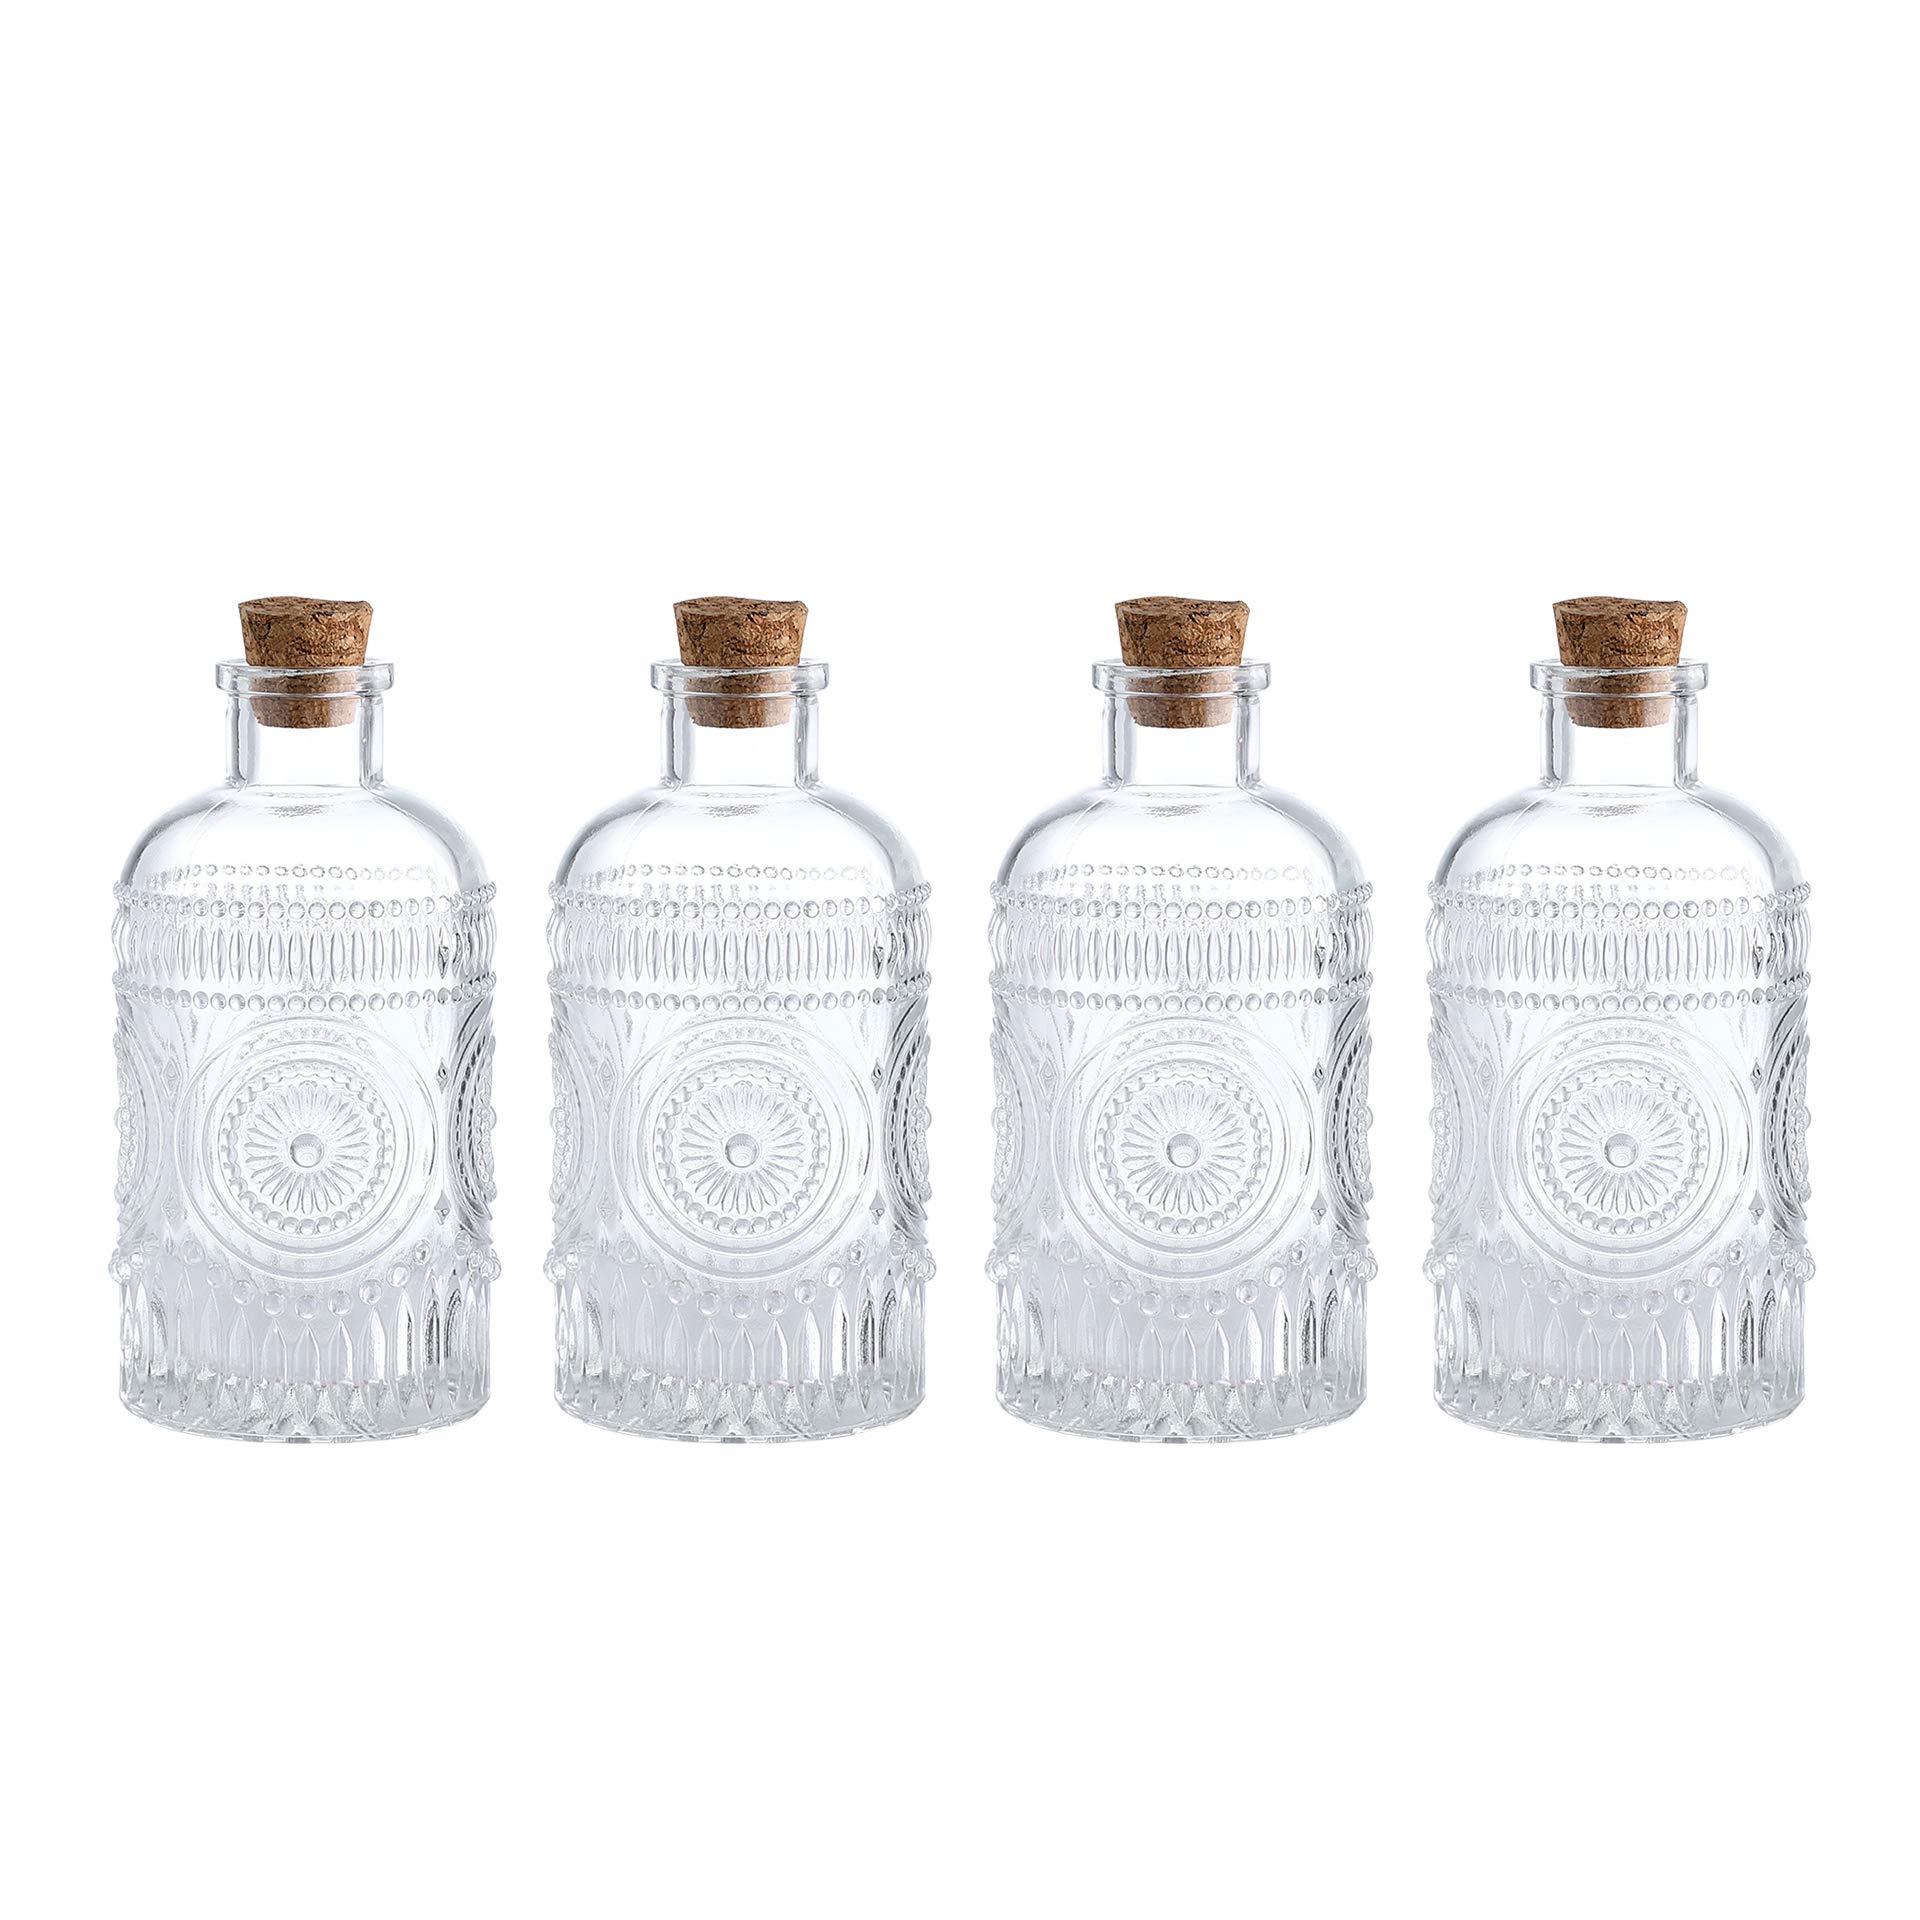 Set of 2 MyGift Vintage Design Embossed Clear Glass Bottles Apothecary Flower Bud Vase with Cork Lid